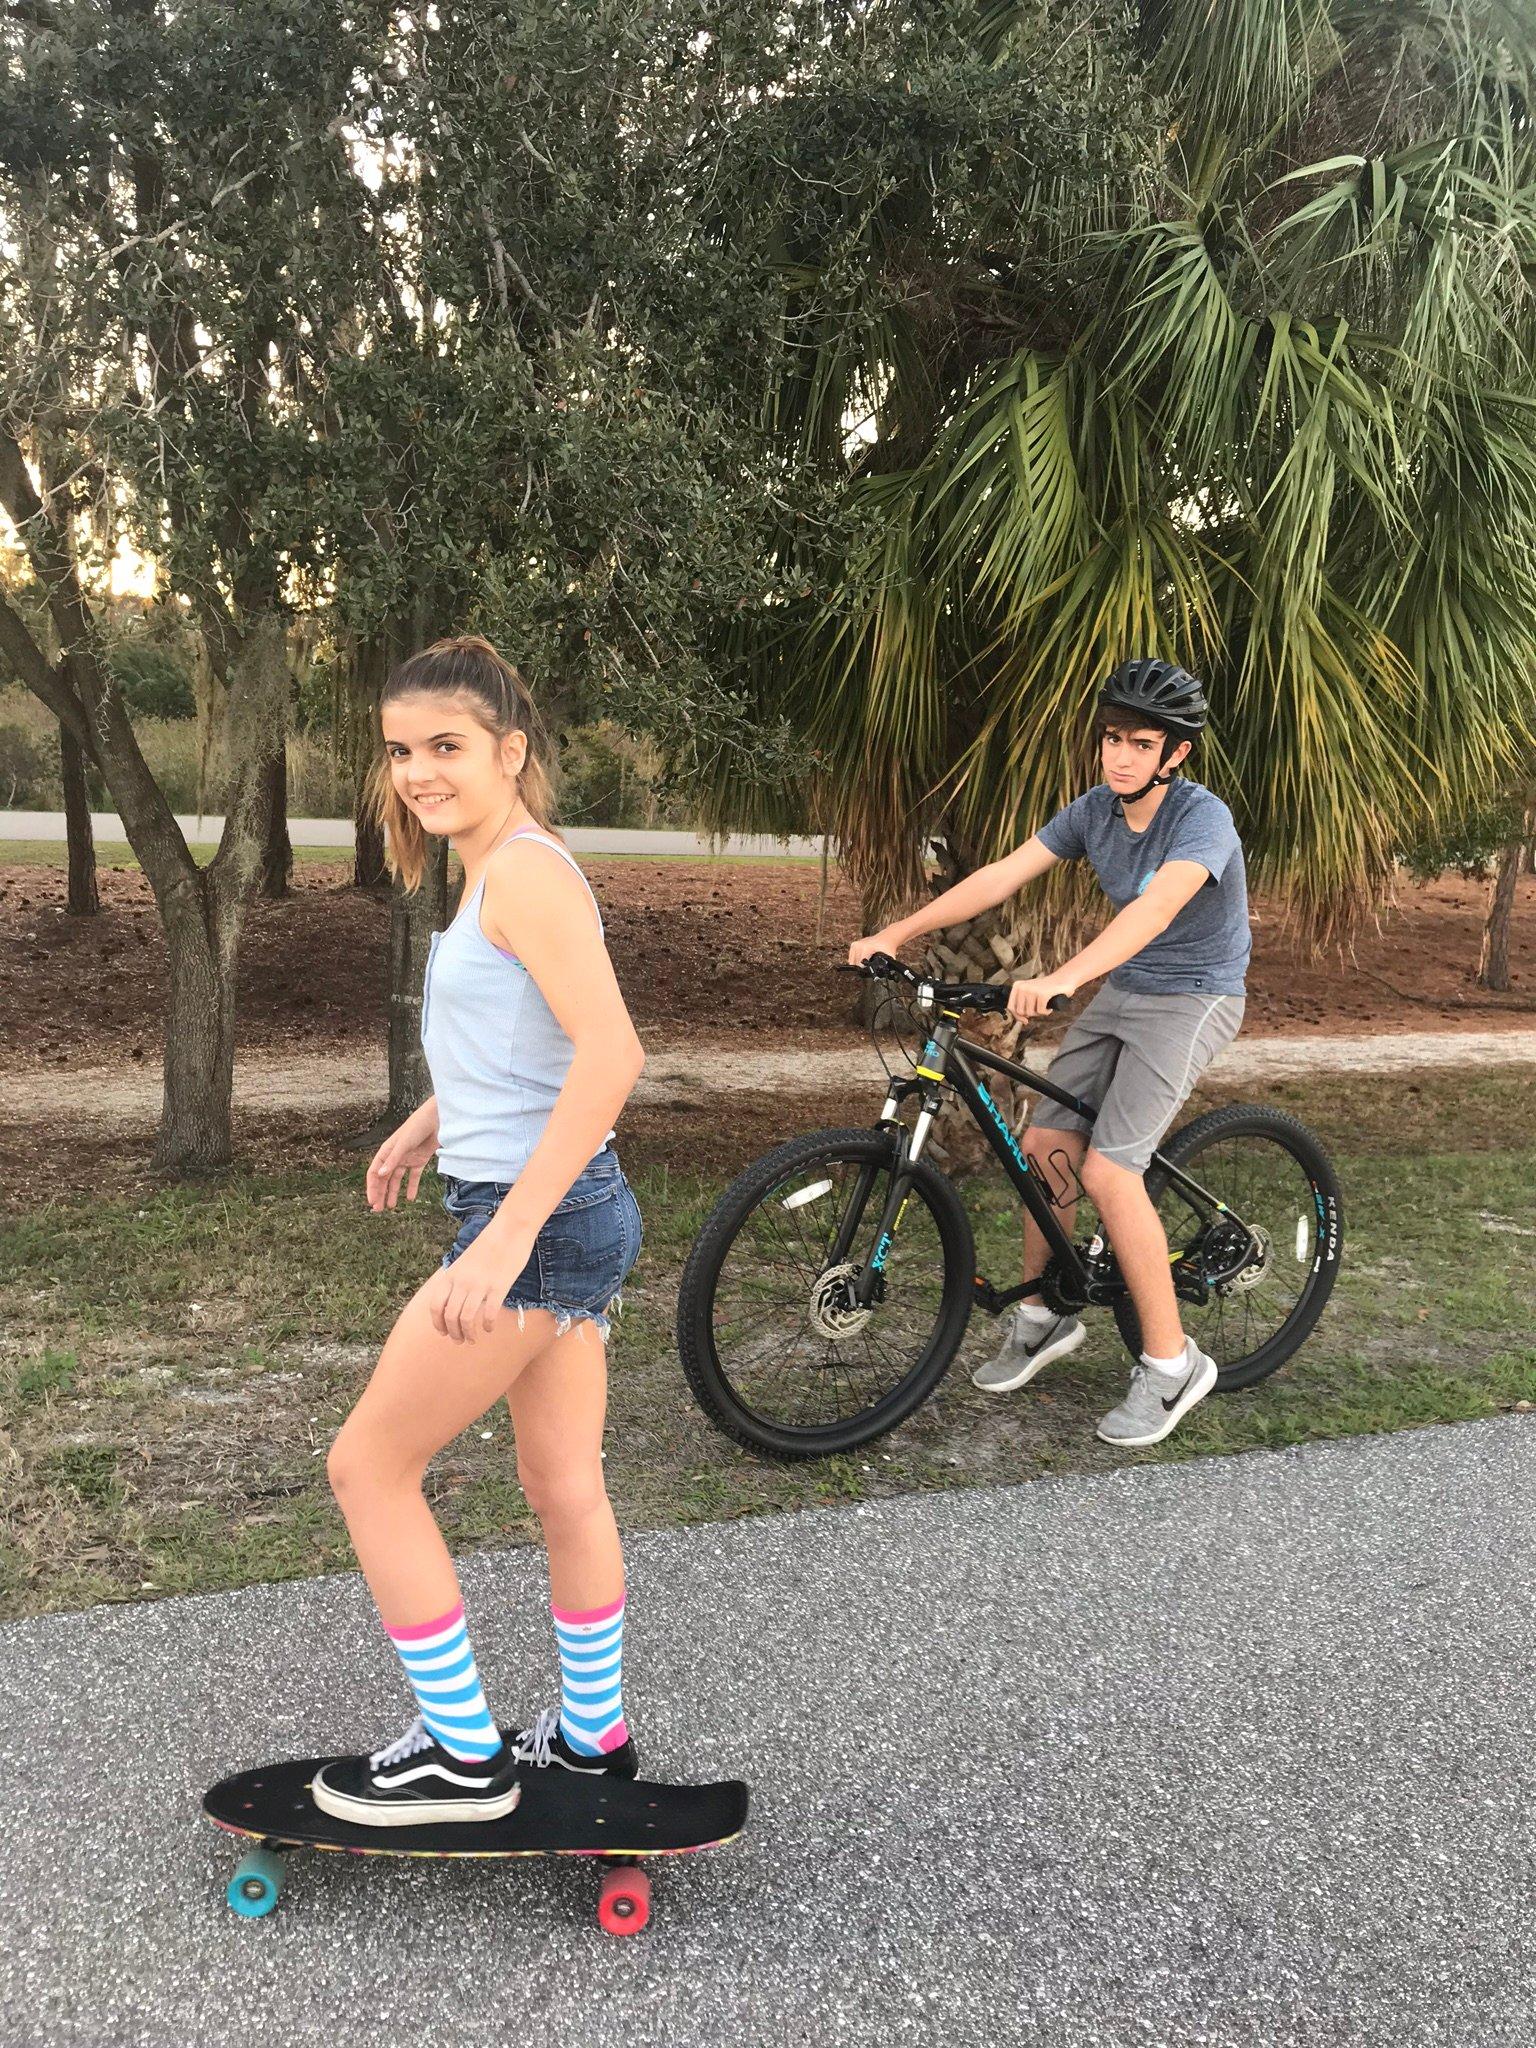 Teen skateboarding and biking